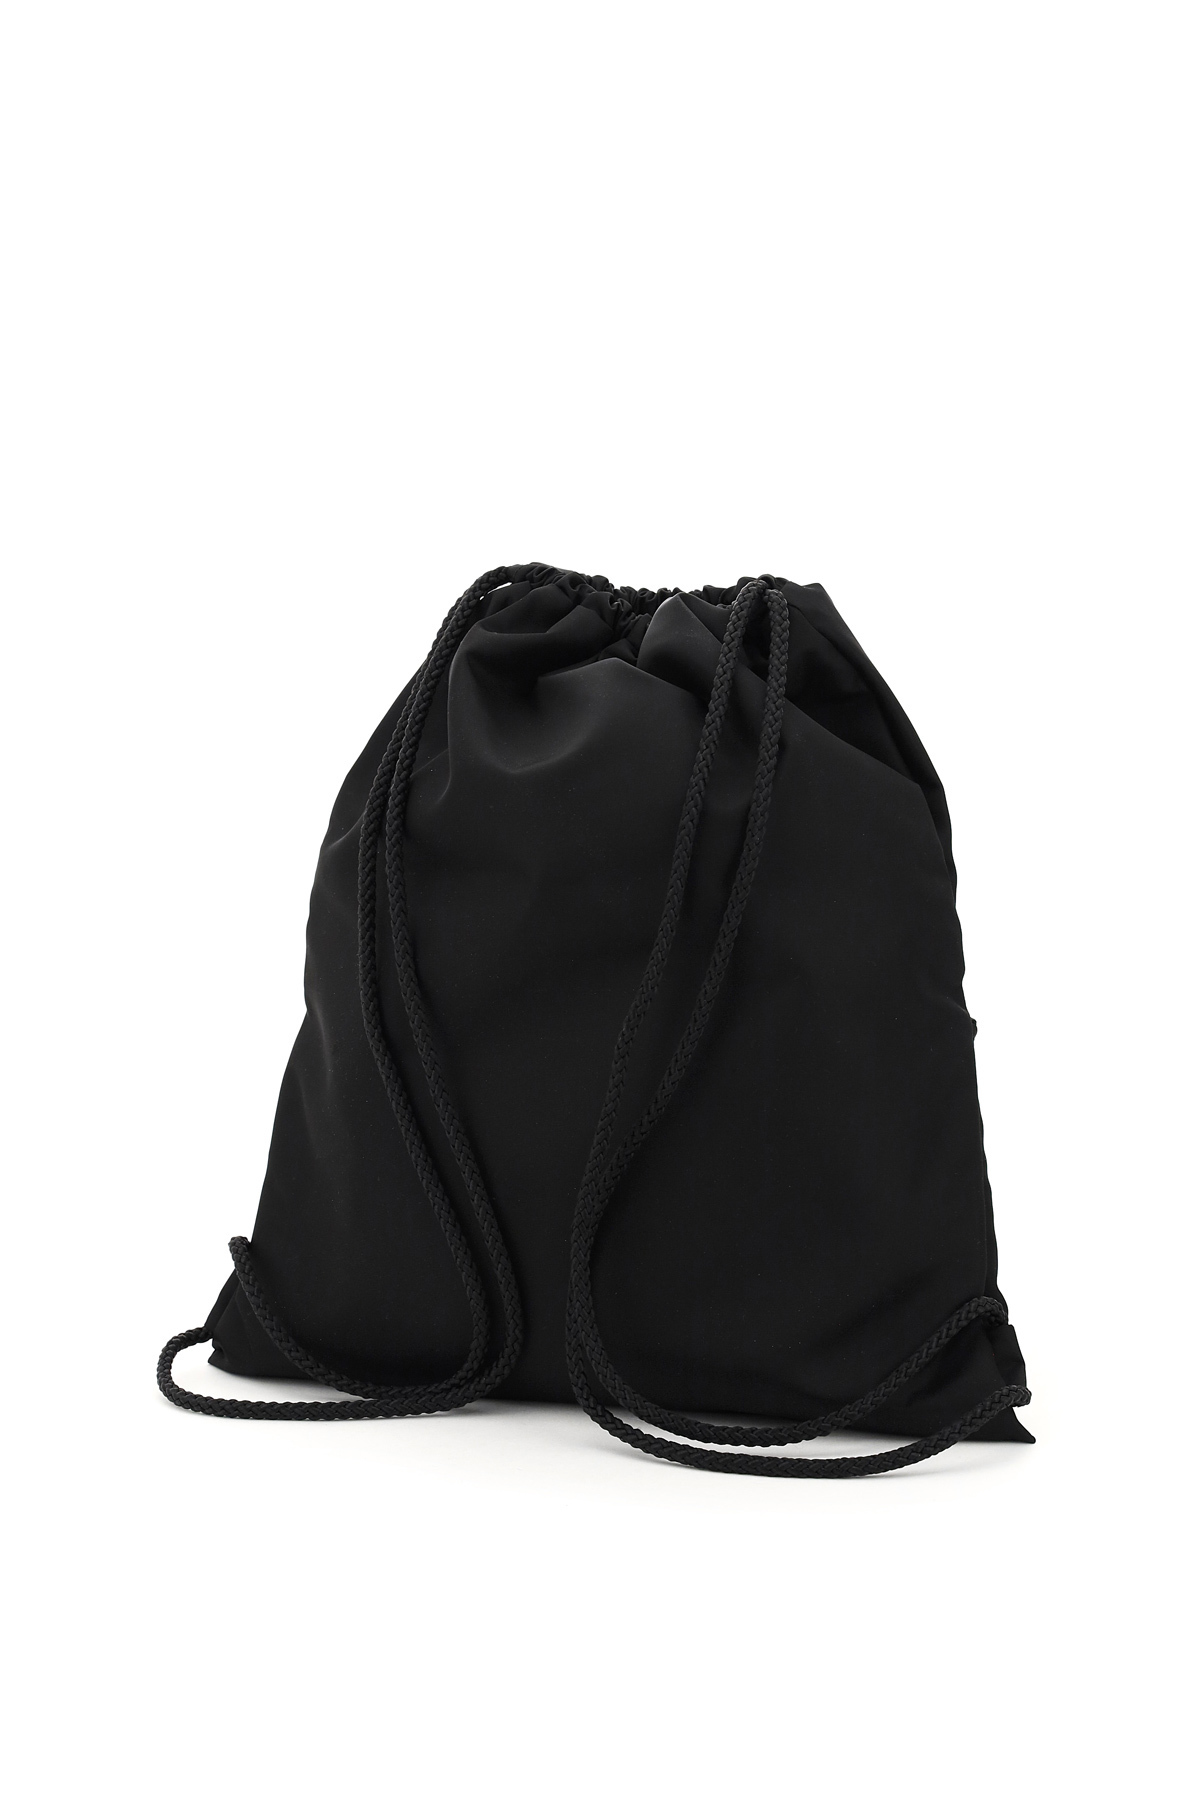 Heron preston sacca zaino in nylon gym bag